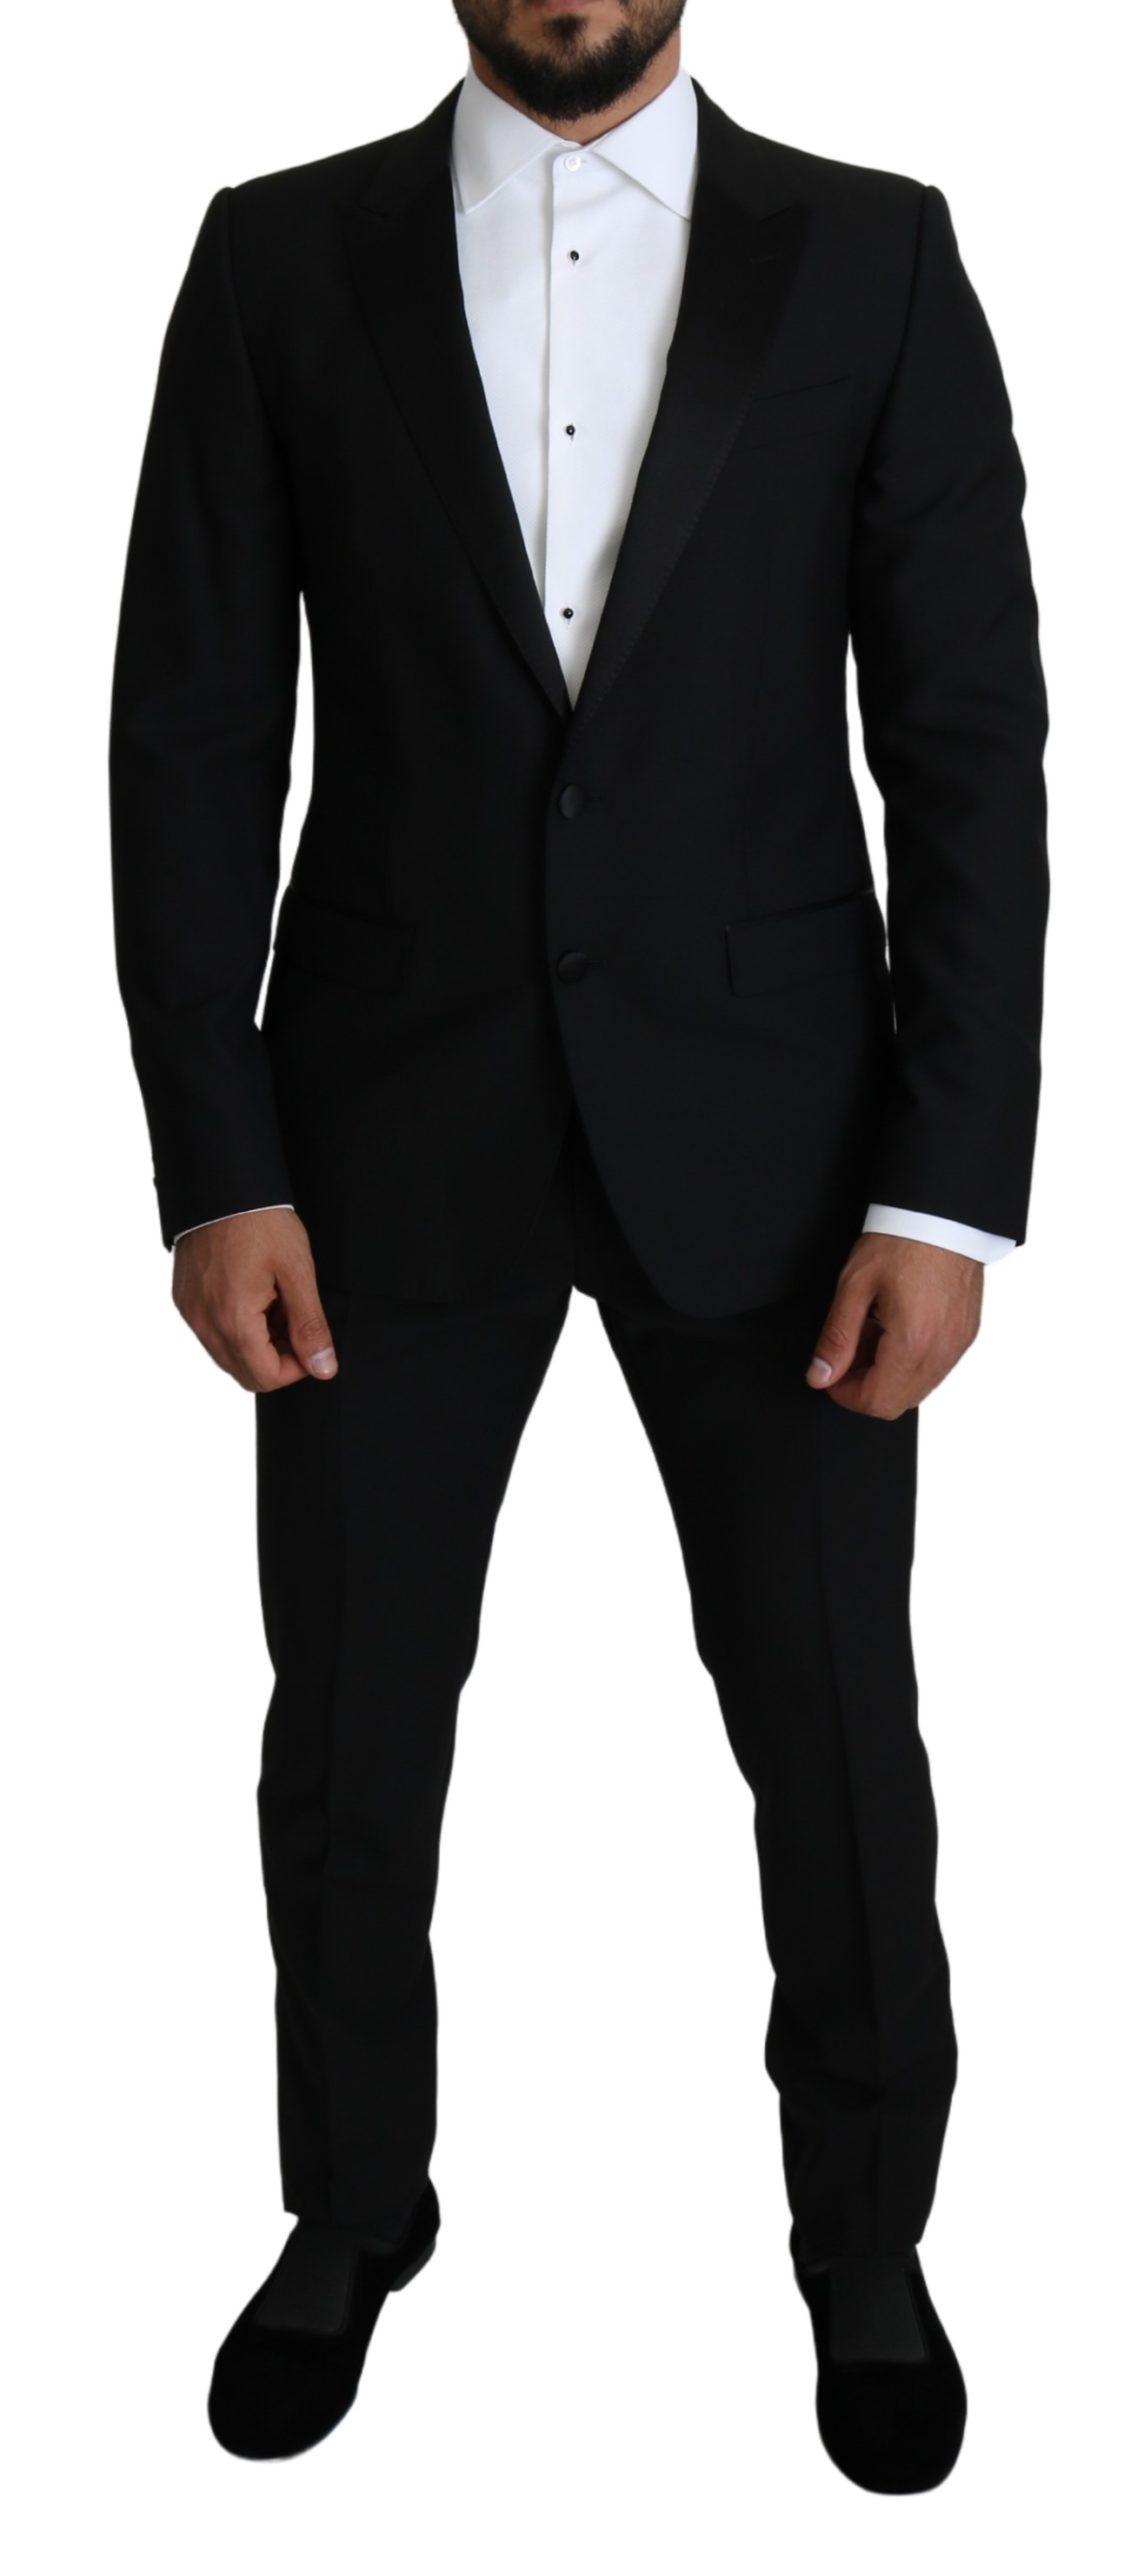 Dolce & Gabbana Men's Slim Smoking 2 Piece MARTINI Suit Black KOS1822 - IT50   L